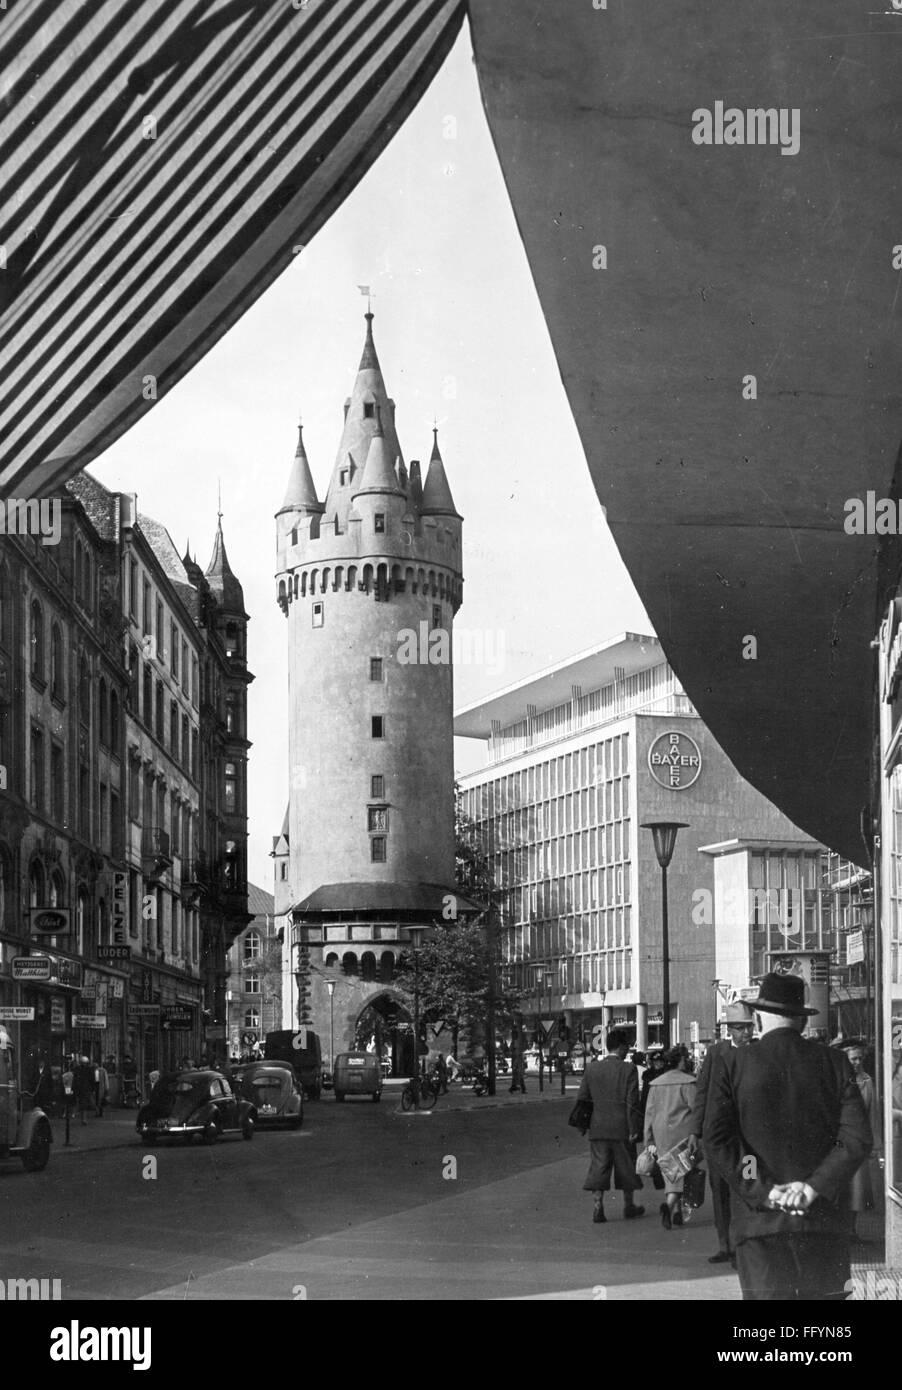 geography / travel, Germany, Frankfurt am Main, streets, Grosse Eschenheimer Strasse with Eschenheimer Turm, view, - Stock Image